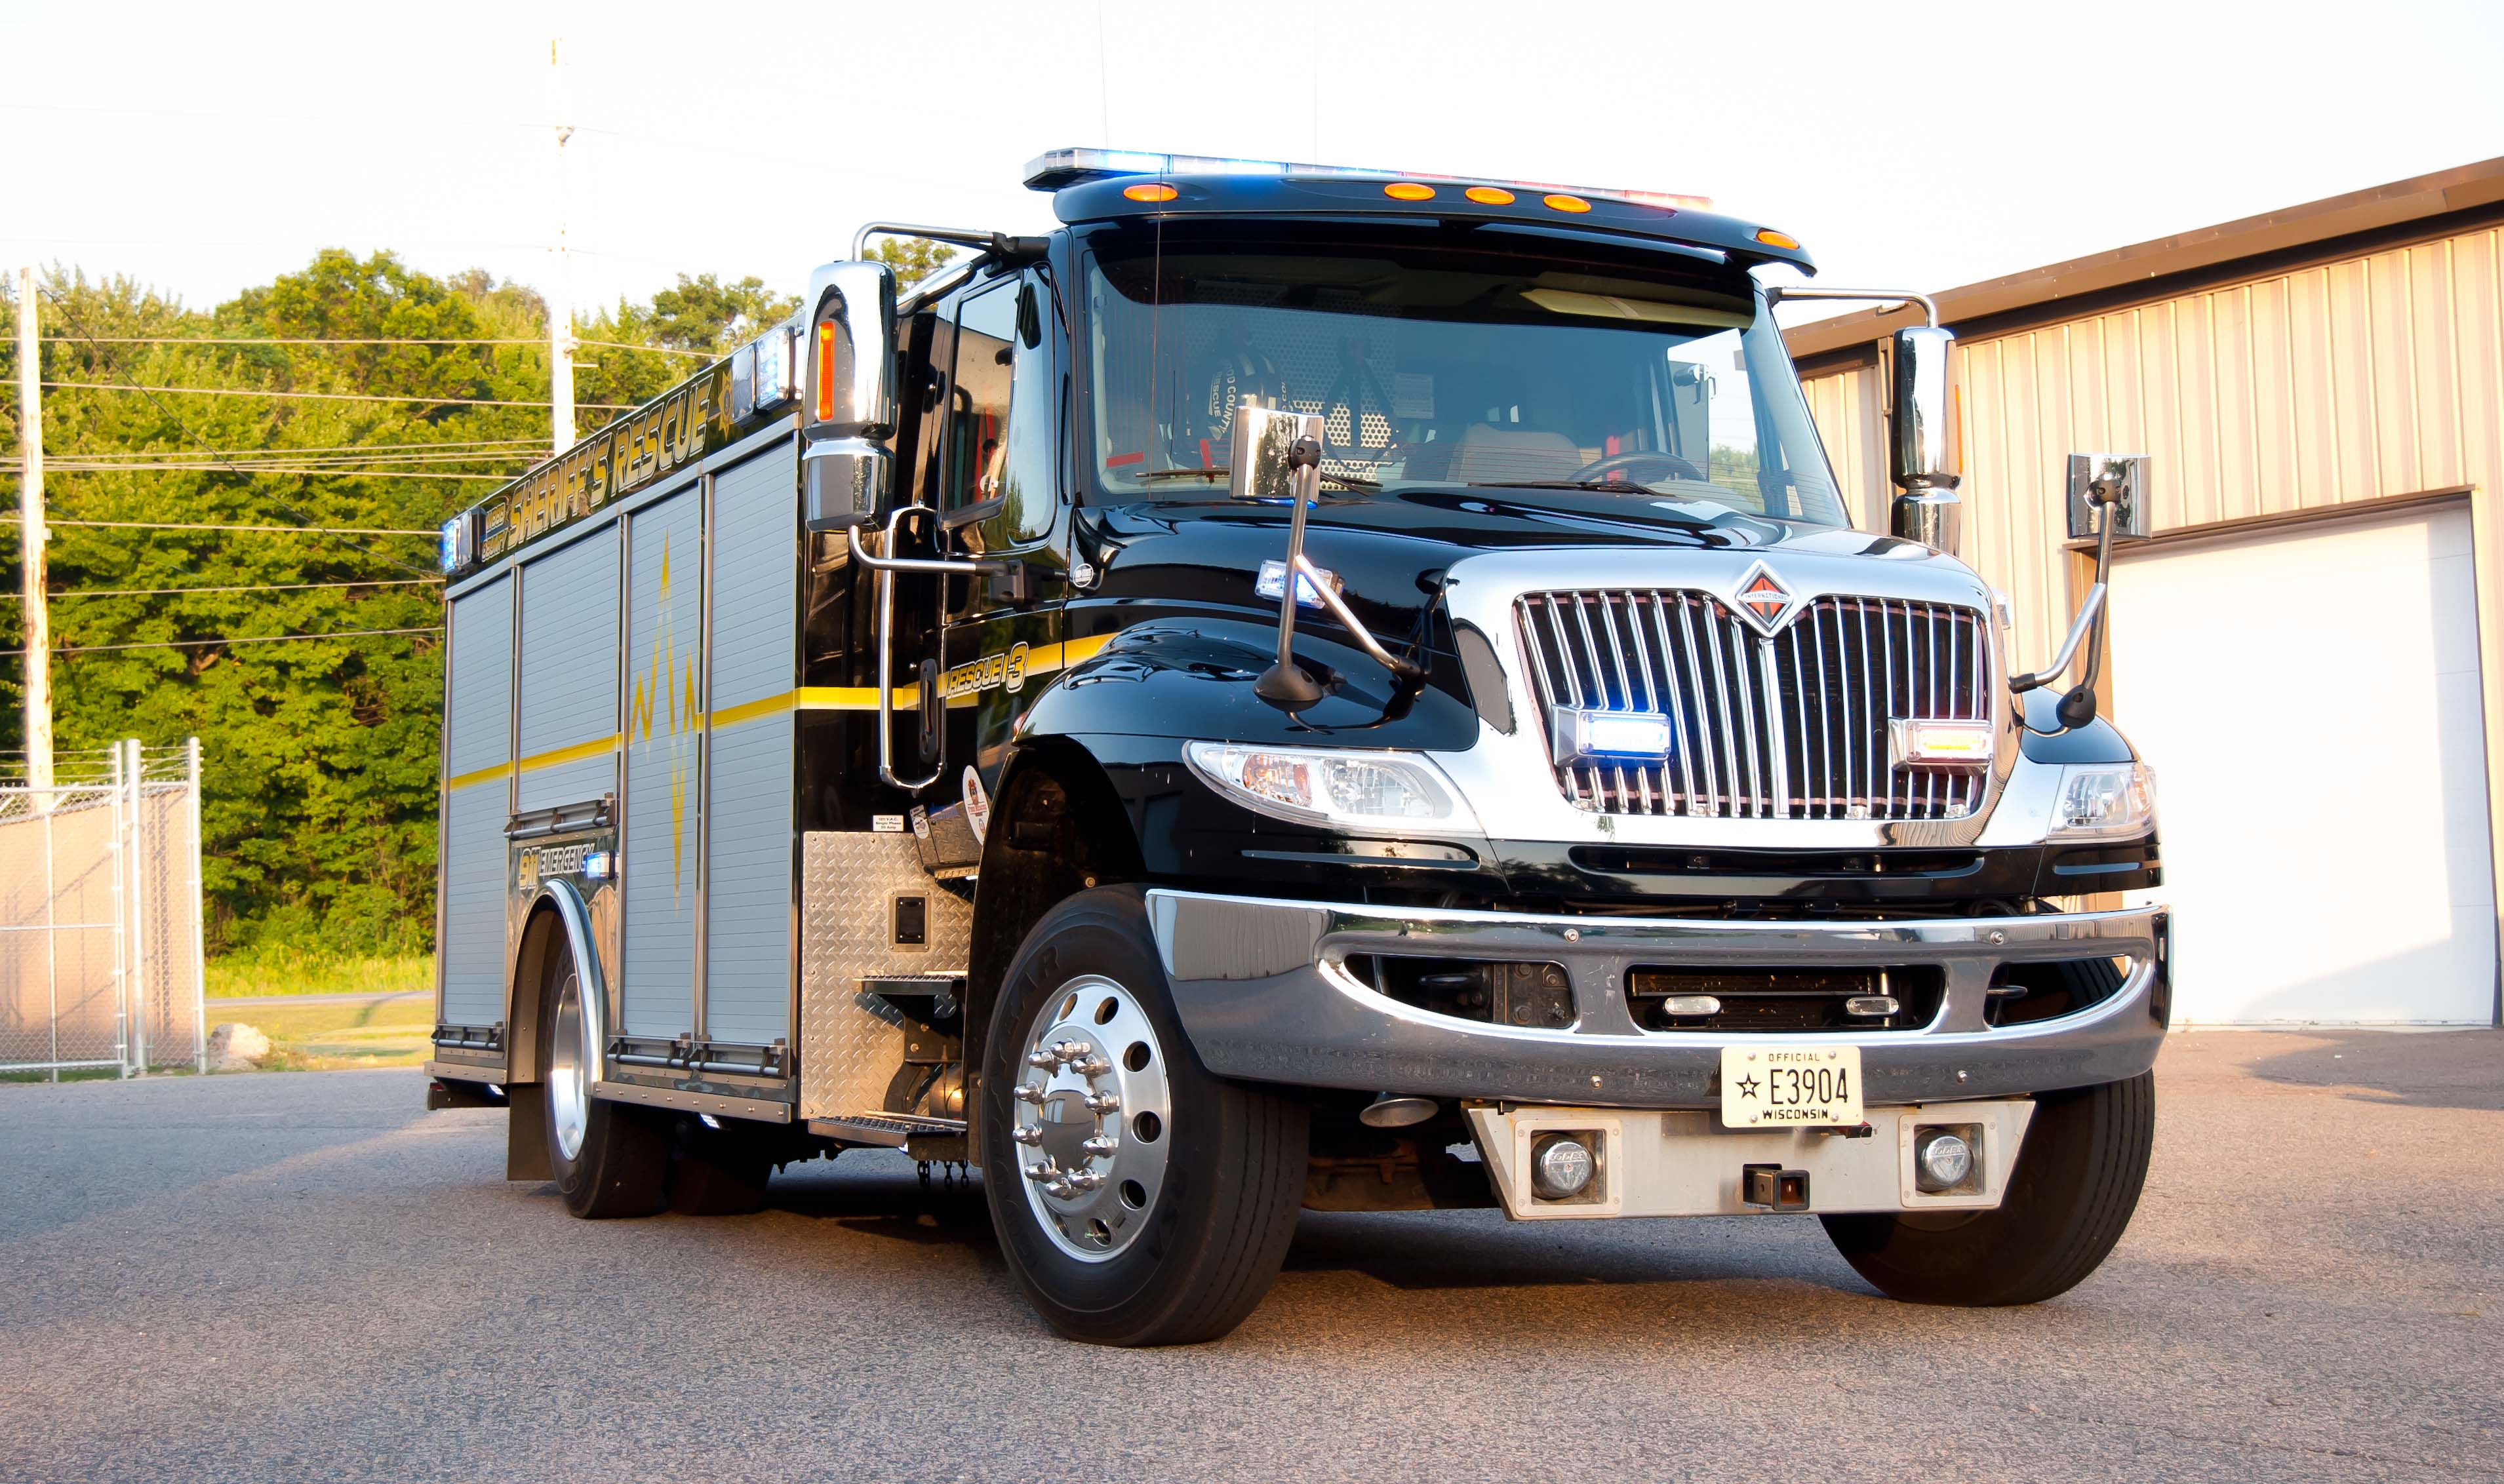 Wisconsin Rapids Rescue